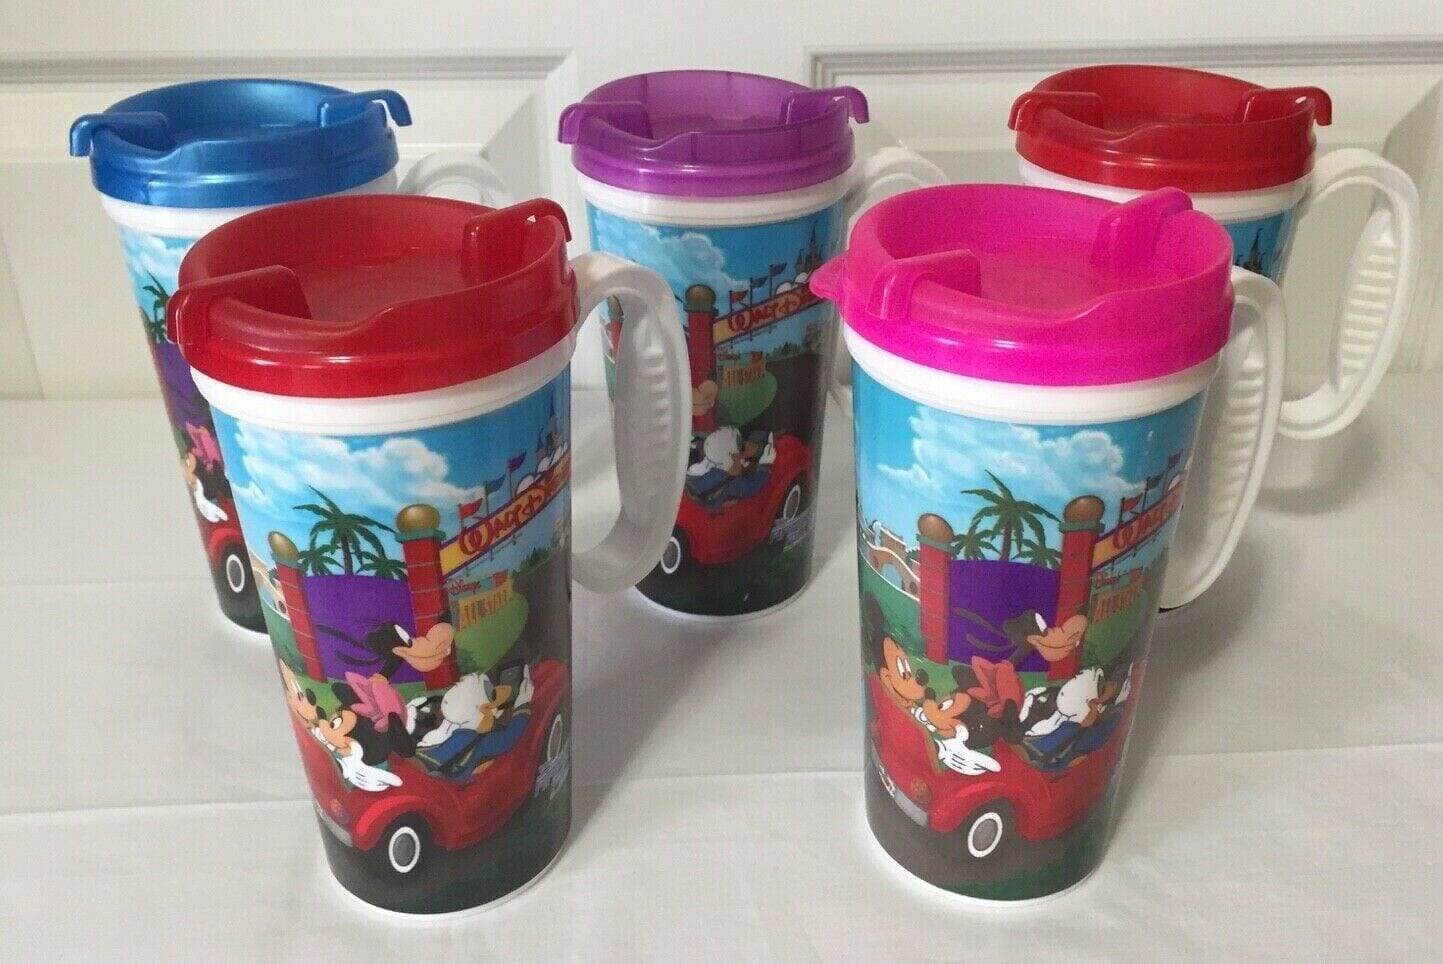 Refillable Mugs Increase to $19.99 at Walt Disney World